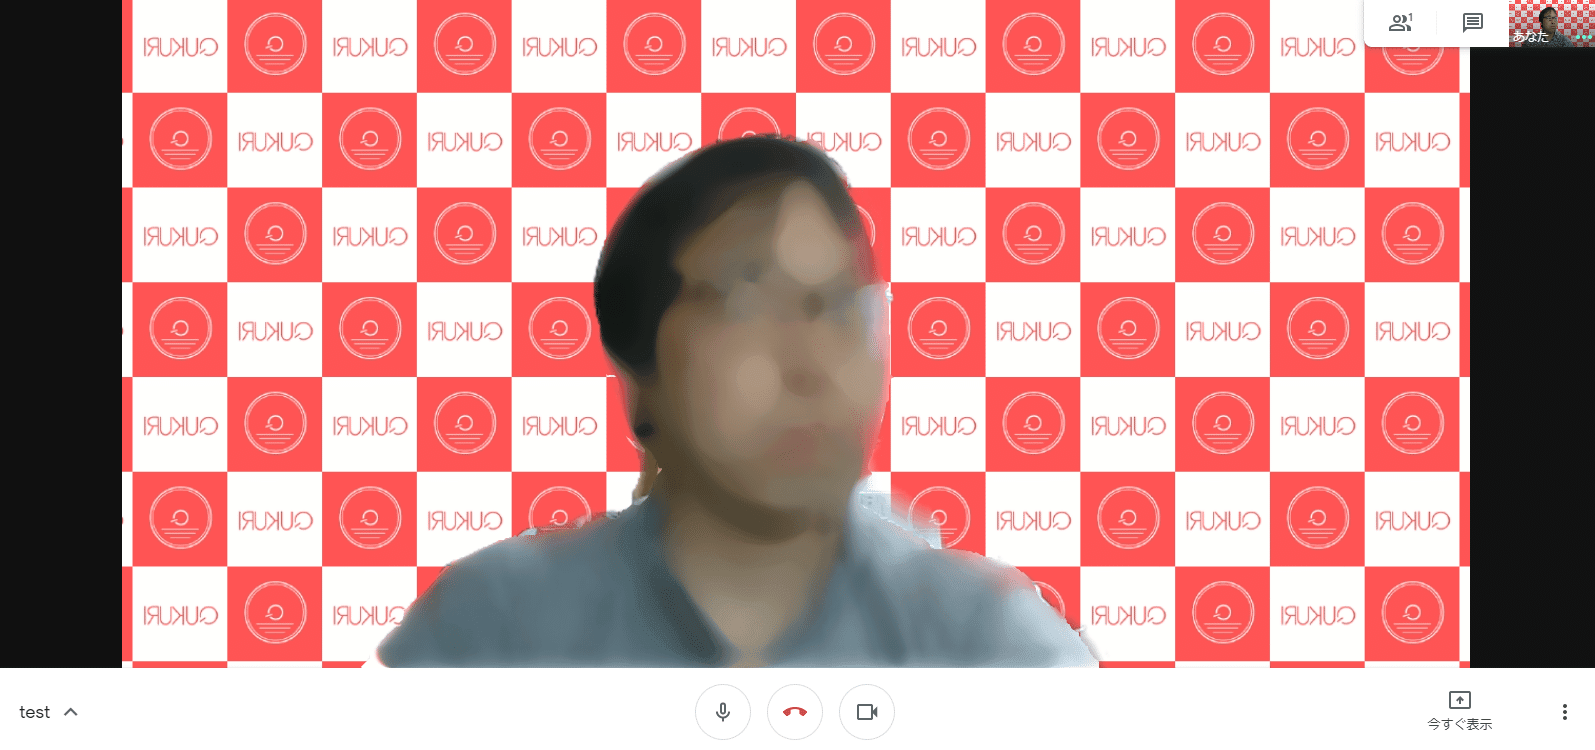 SnapCameraでオリジナル背景